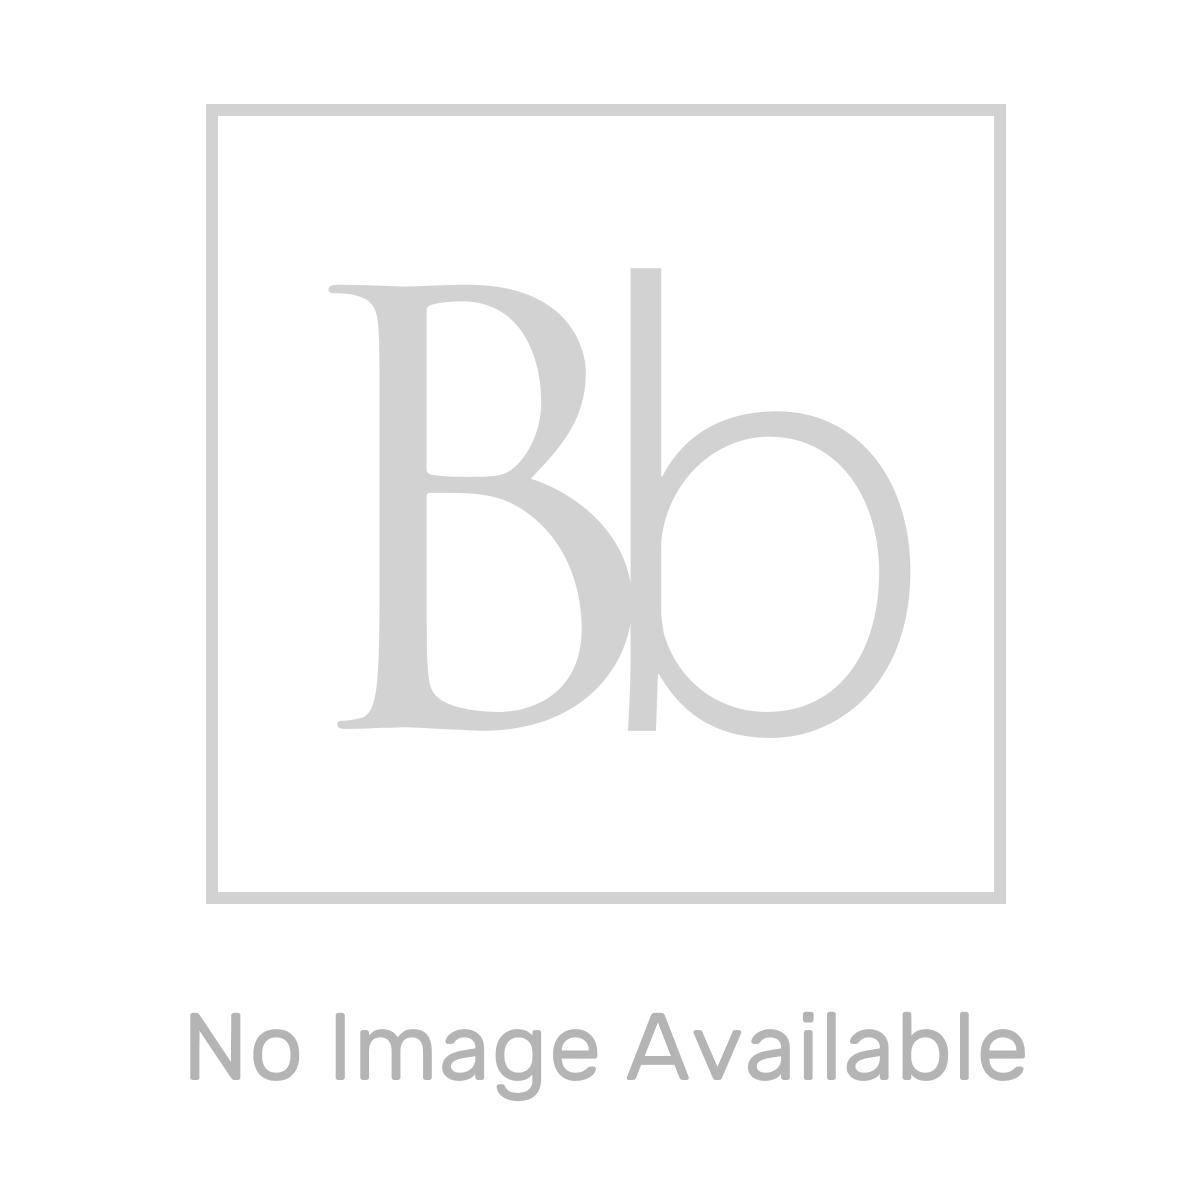 900 x 900 Shower Tray Slate Grey Quadrant Low Profile by Pearlstone